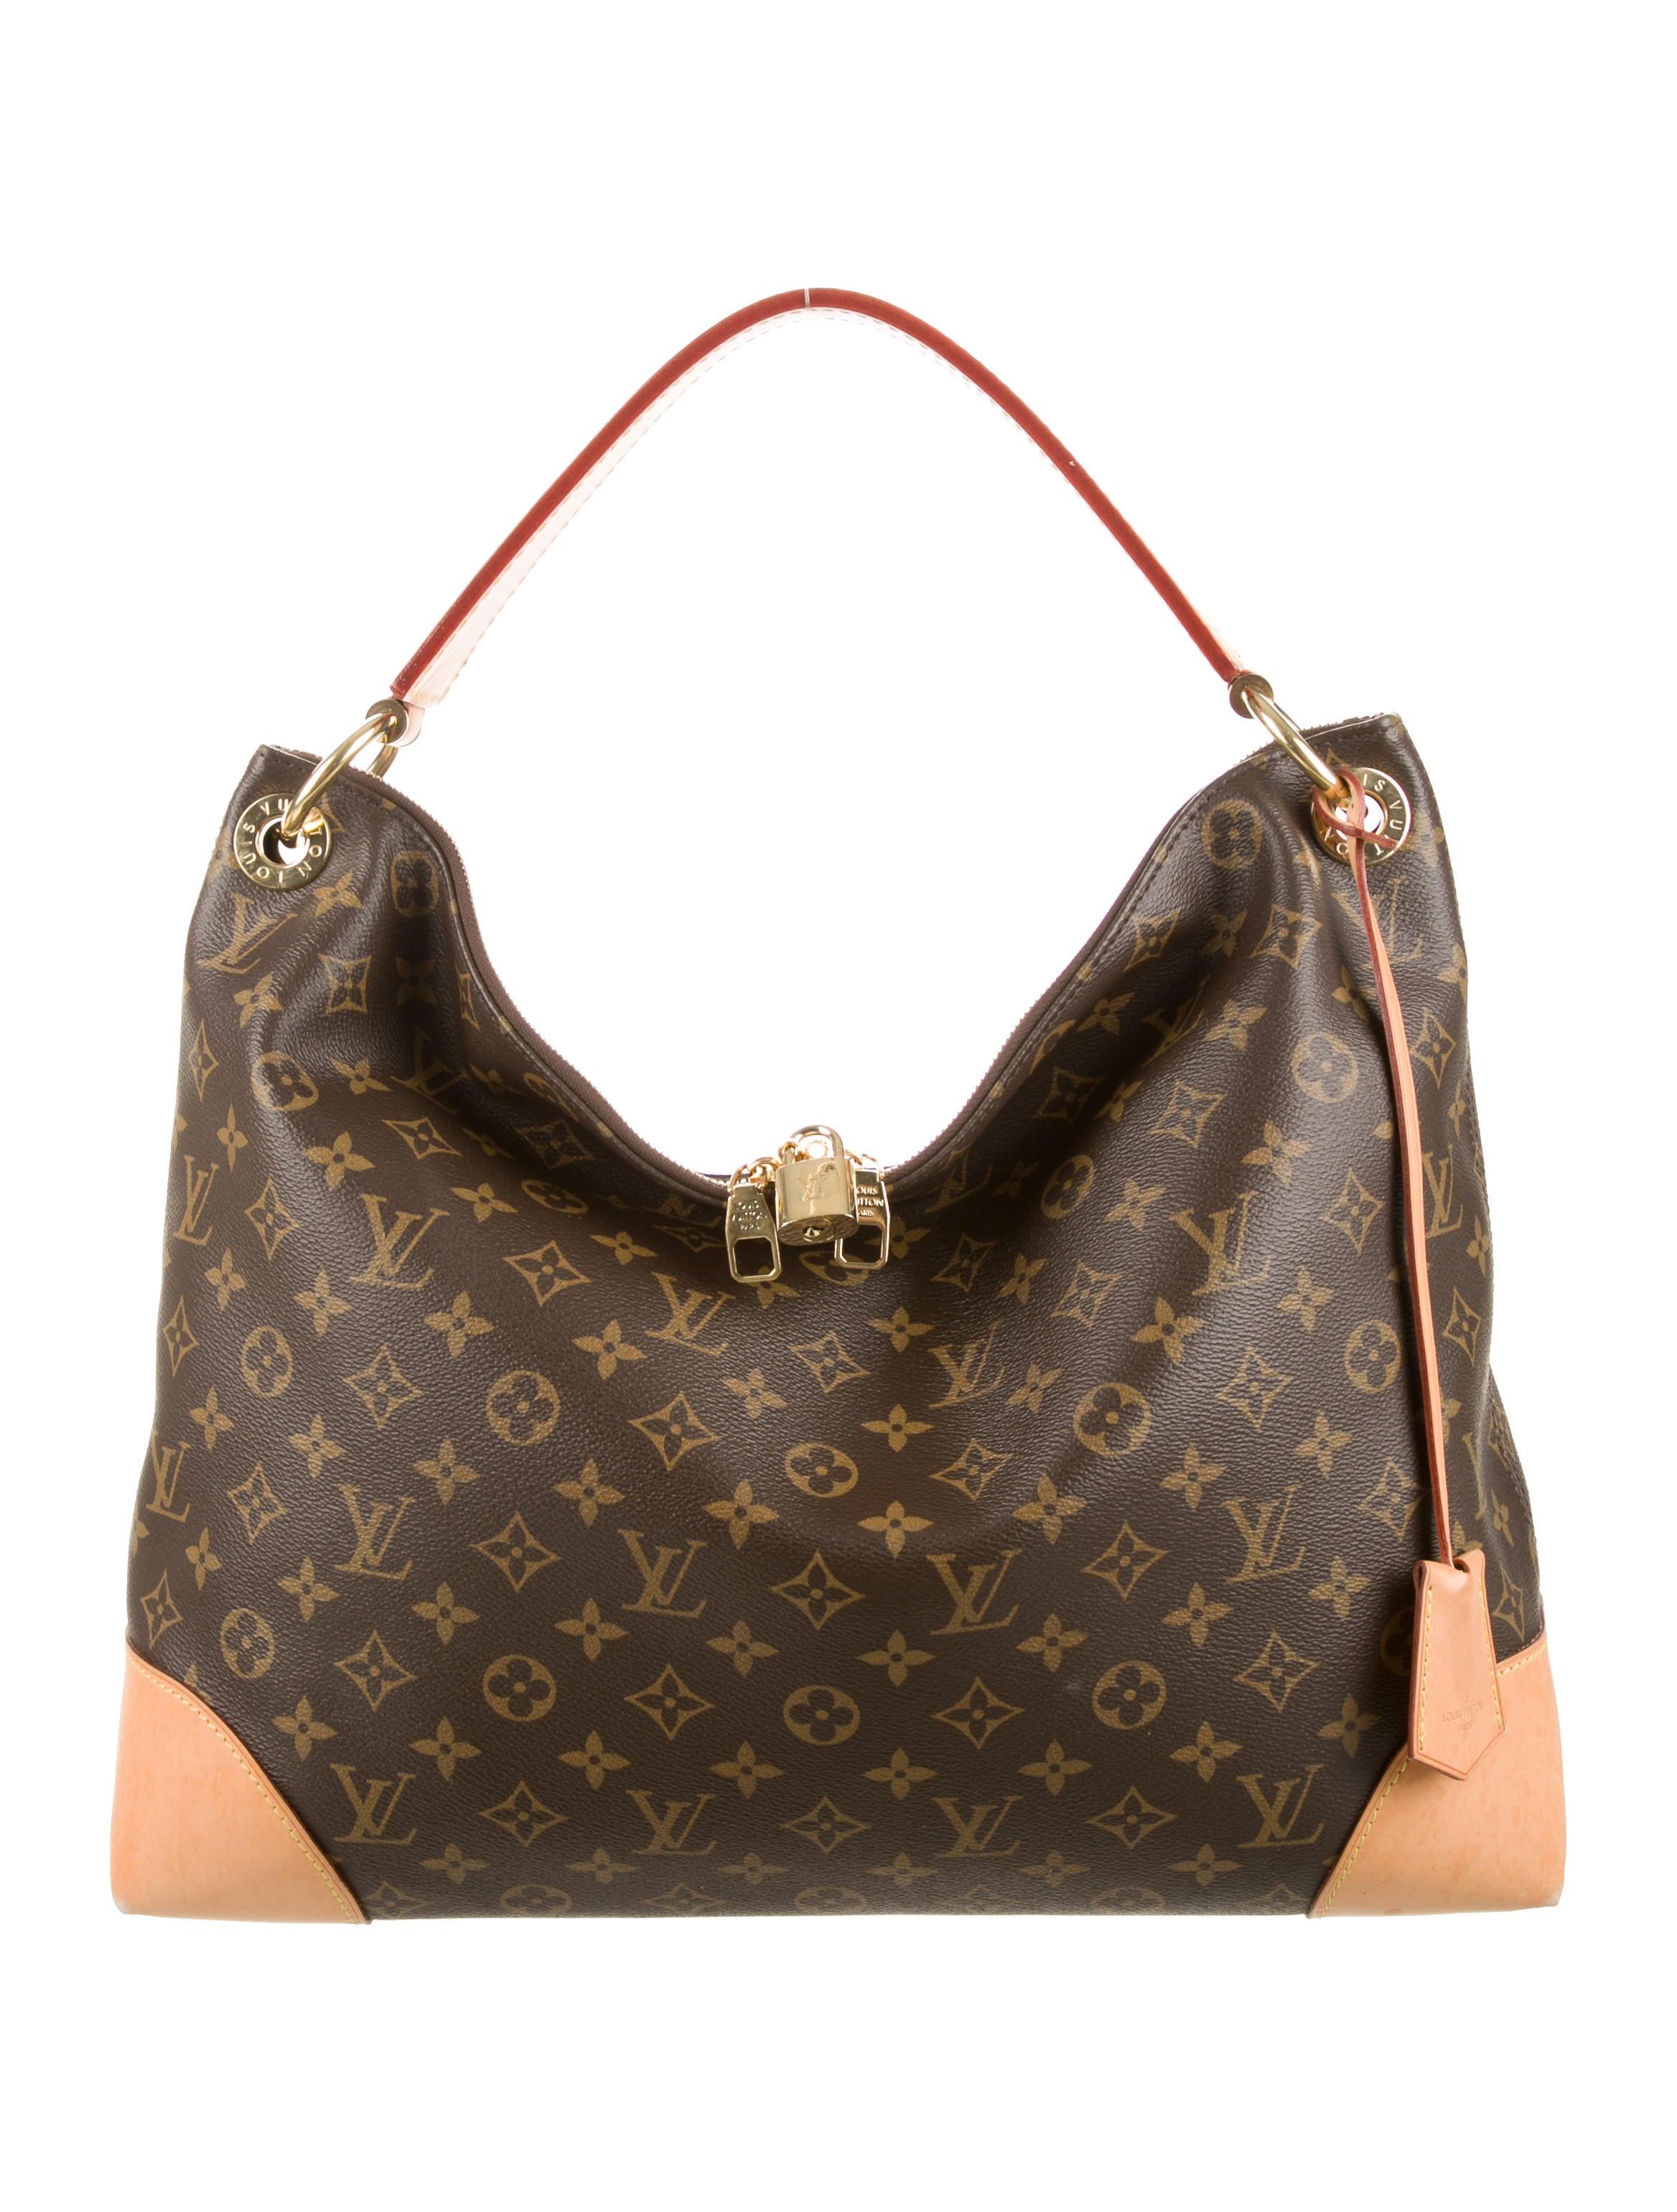 Louis Vuitton 2016 Monogram Berri MM - Handbags - LOU104711   The ... e906111eb02